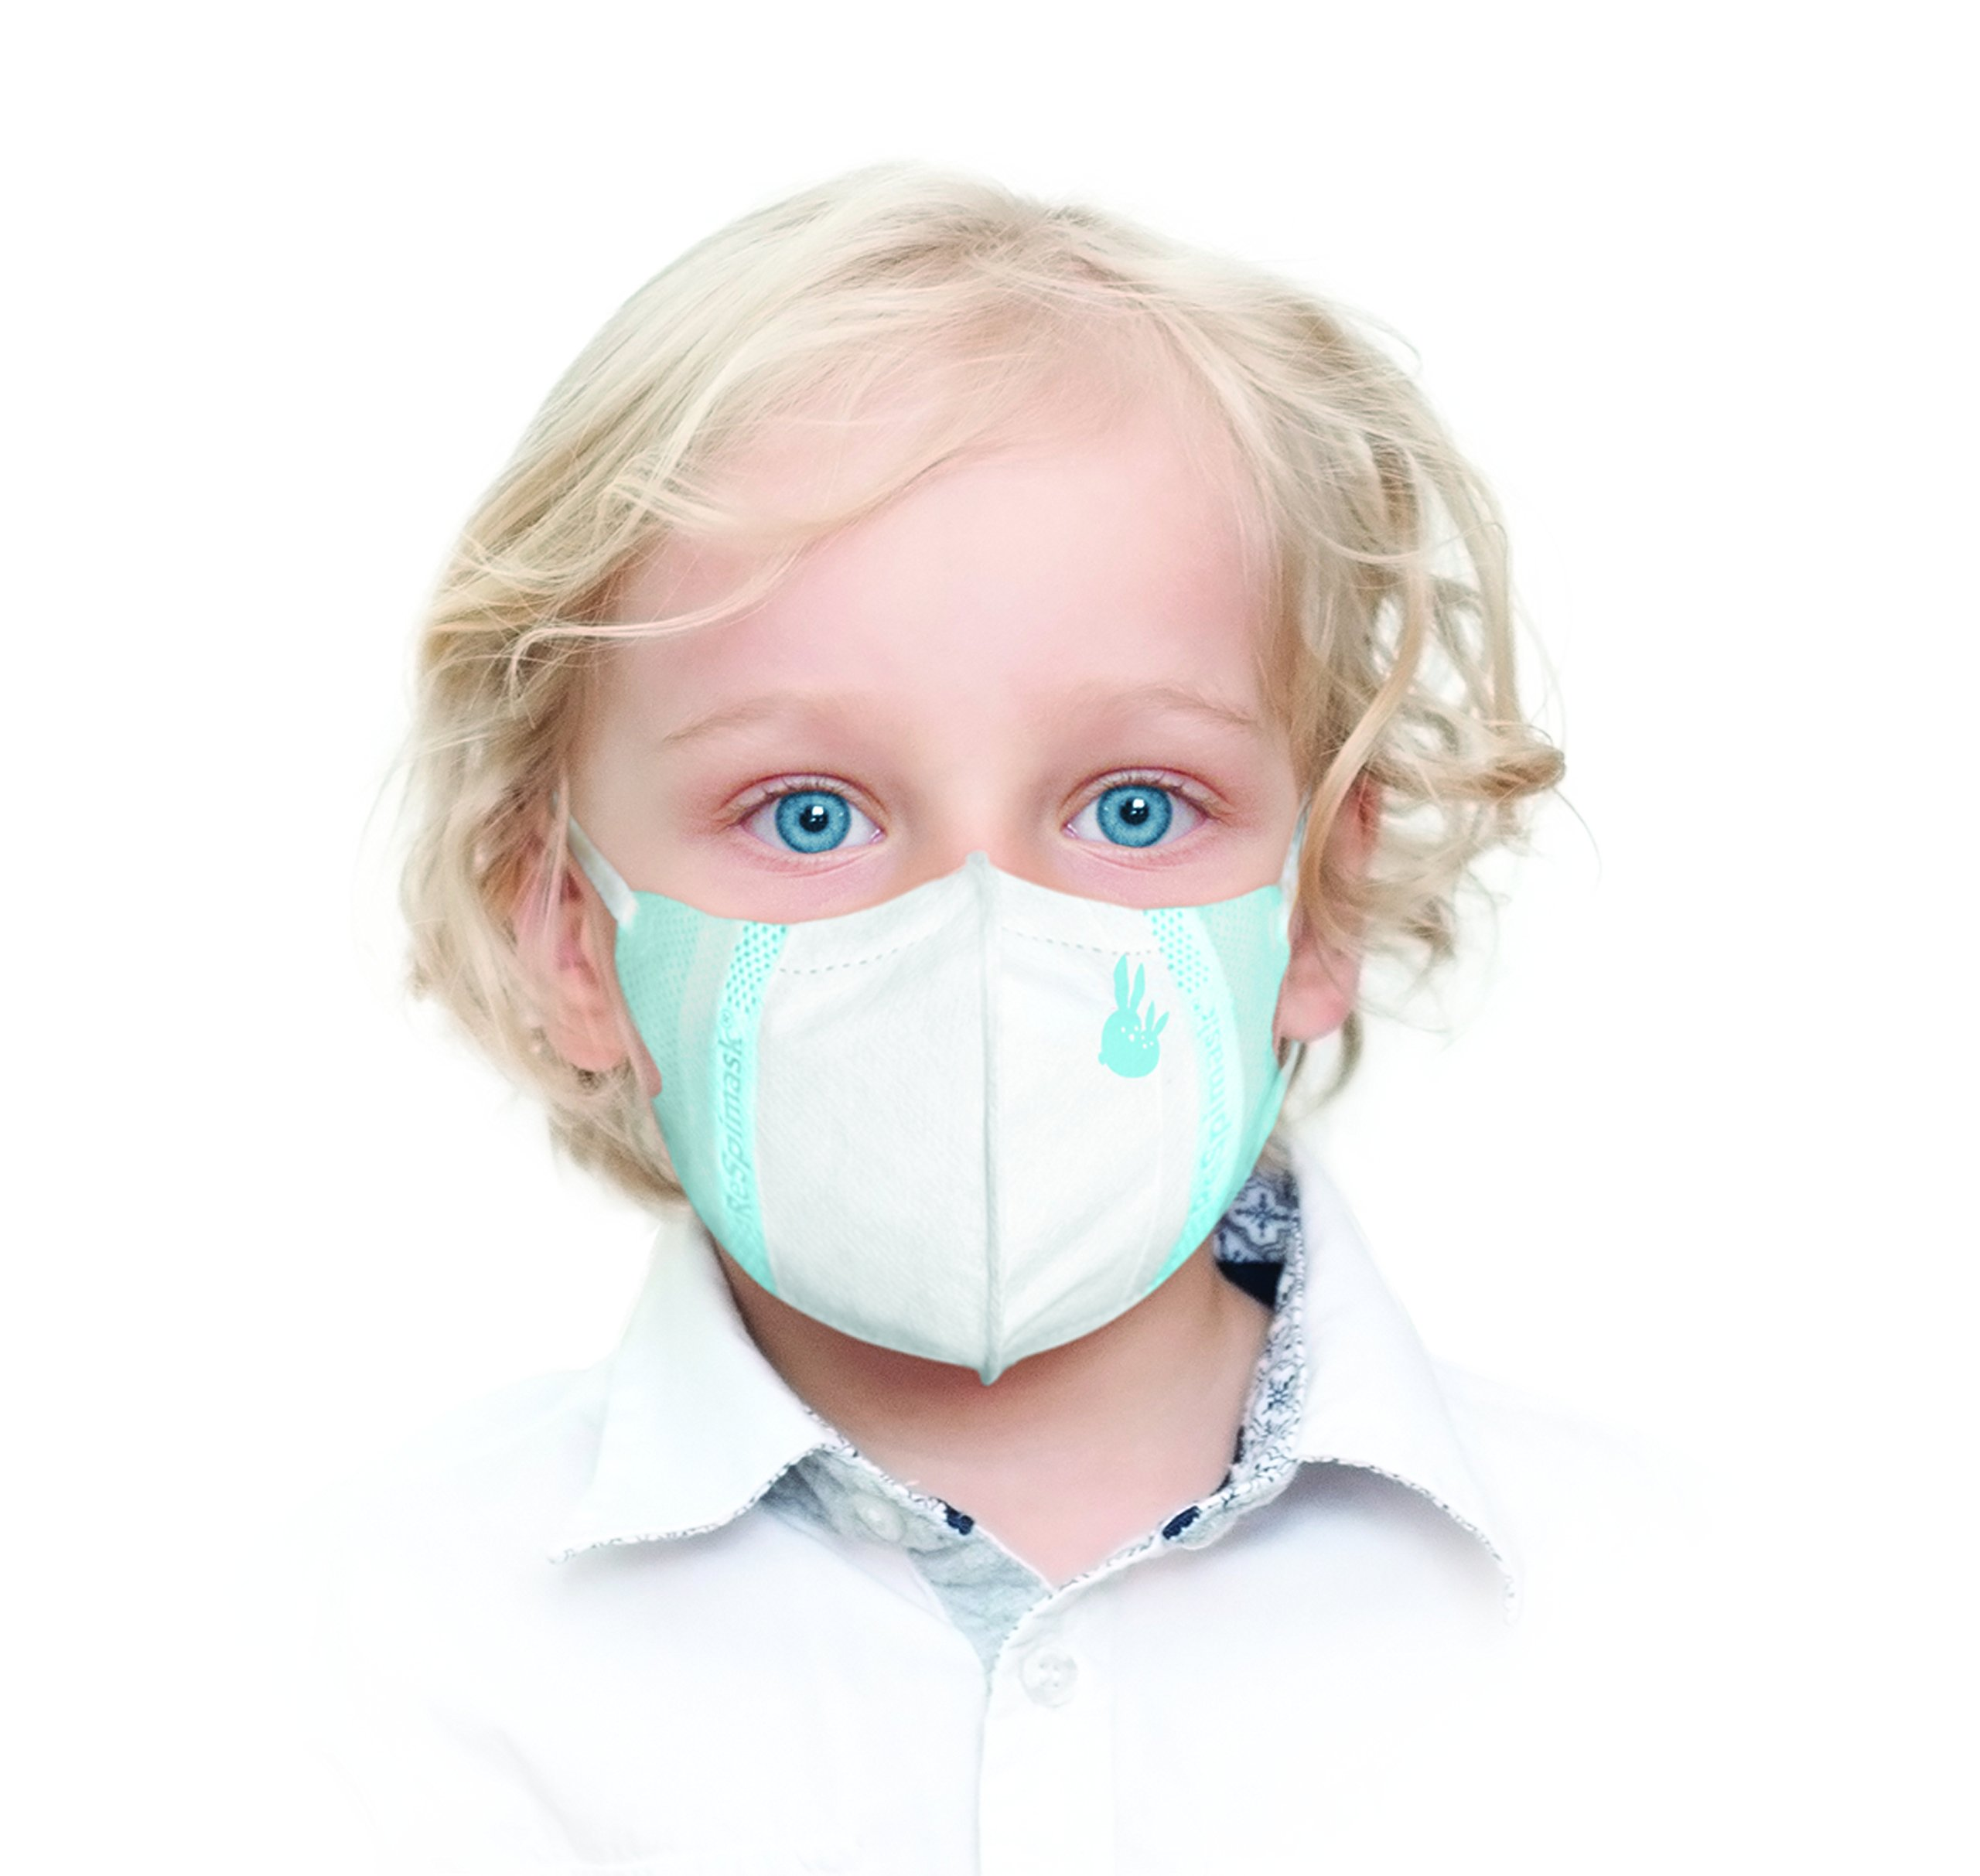 ReSpimask® (10 pack) Antiviral Face Mask – Bacteria, Virus, Dust, Smog, Allergy 99.9% Protection (S)